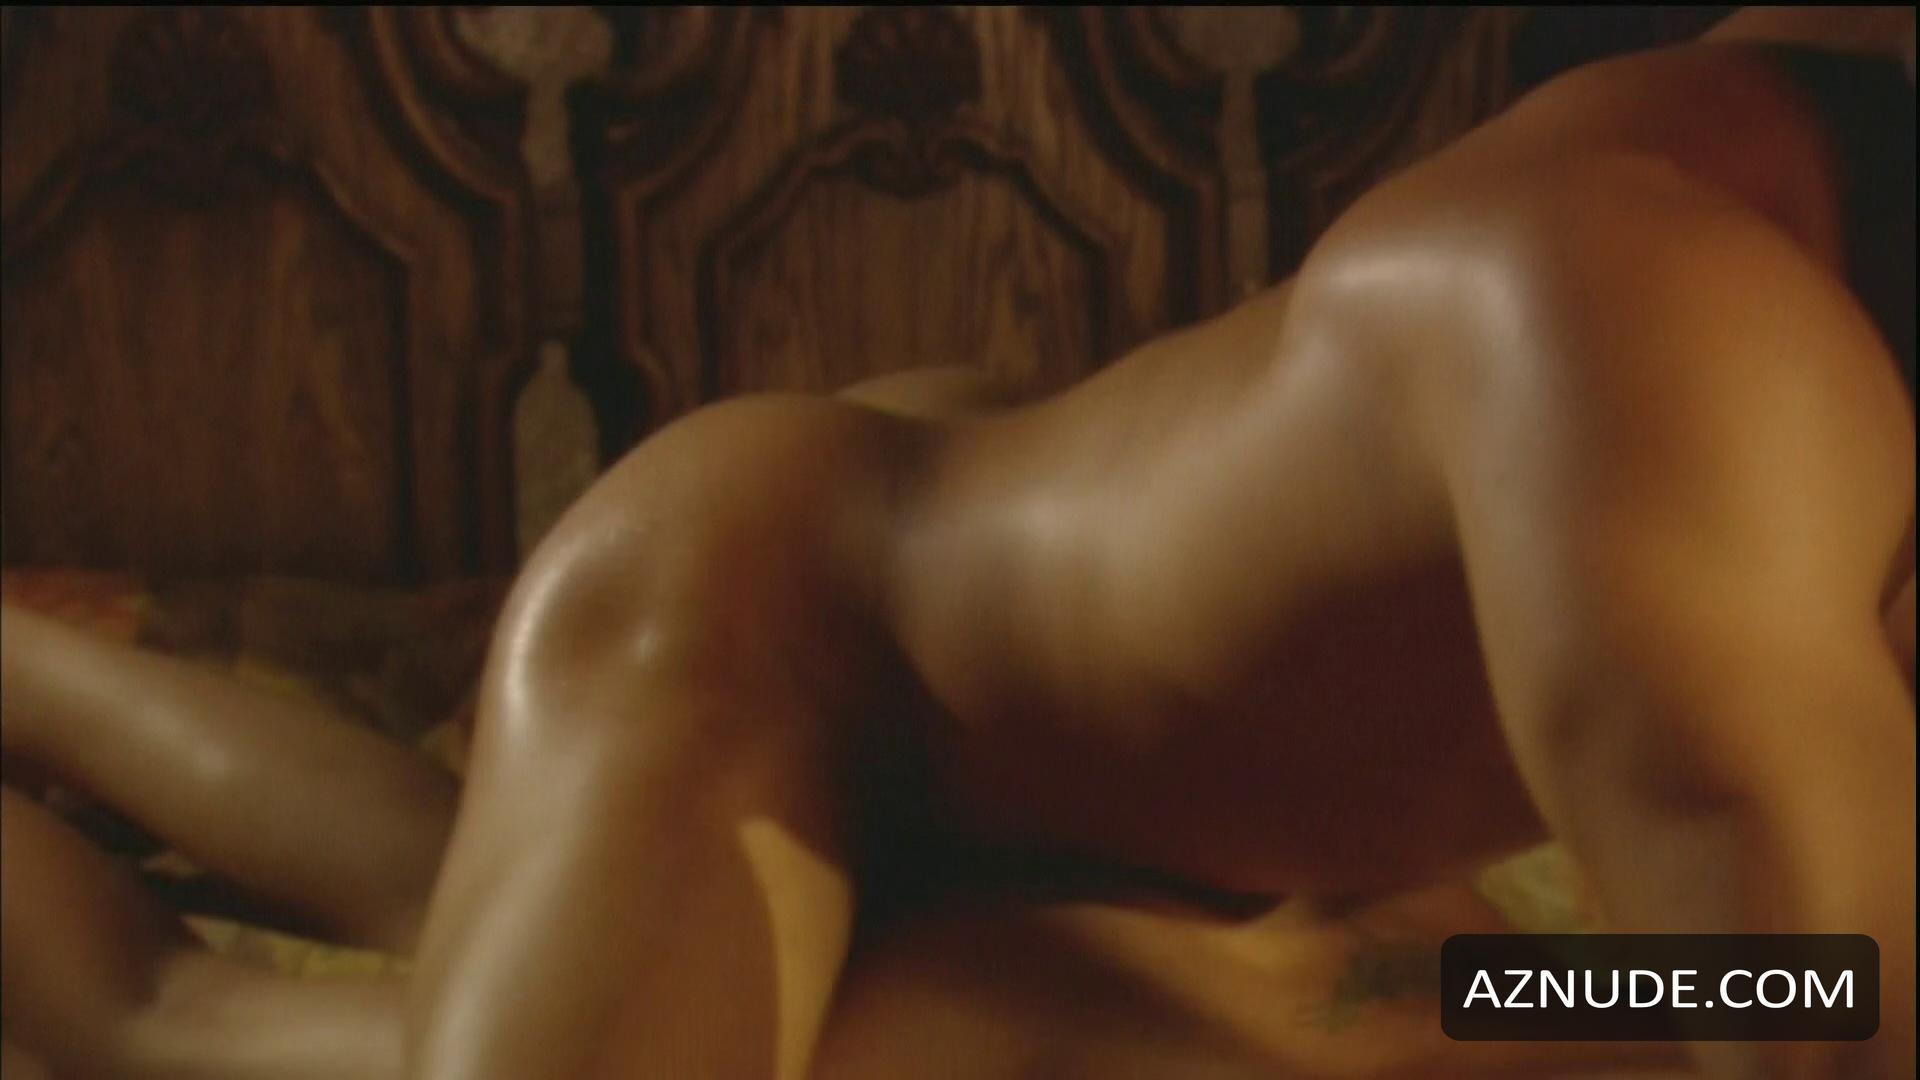 Free nude pics sites-7156